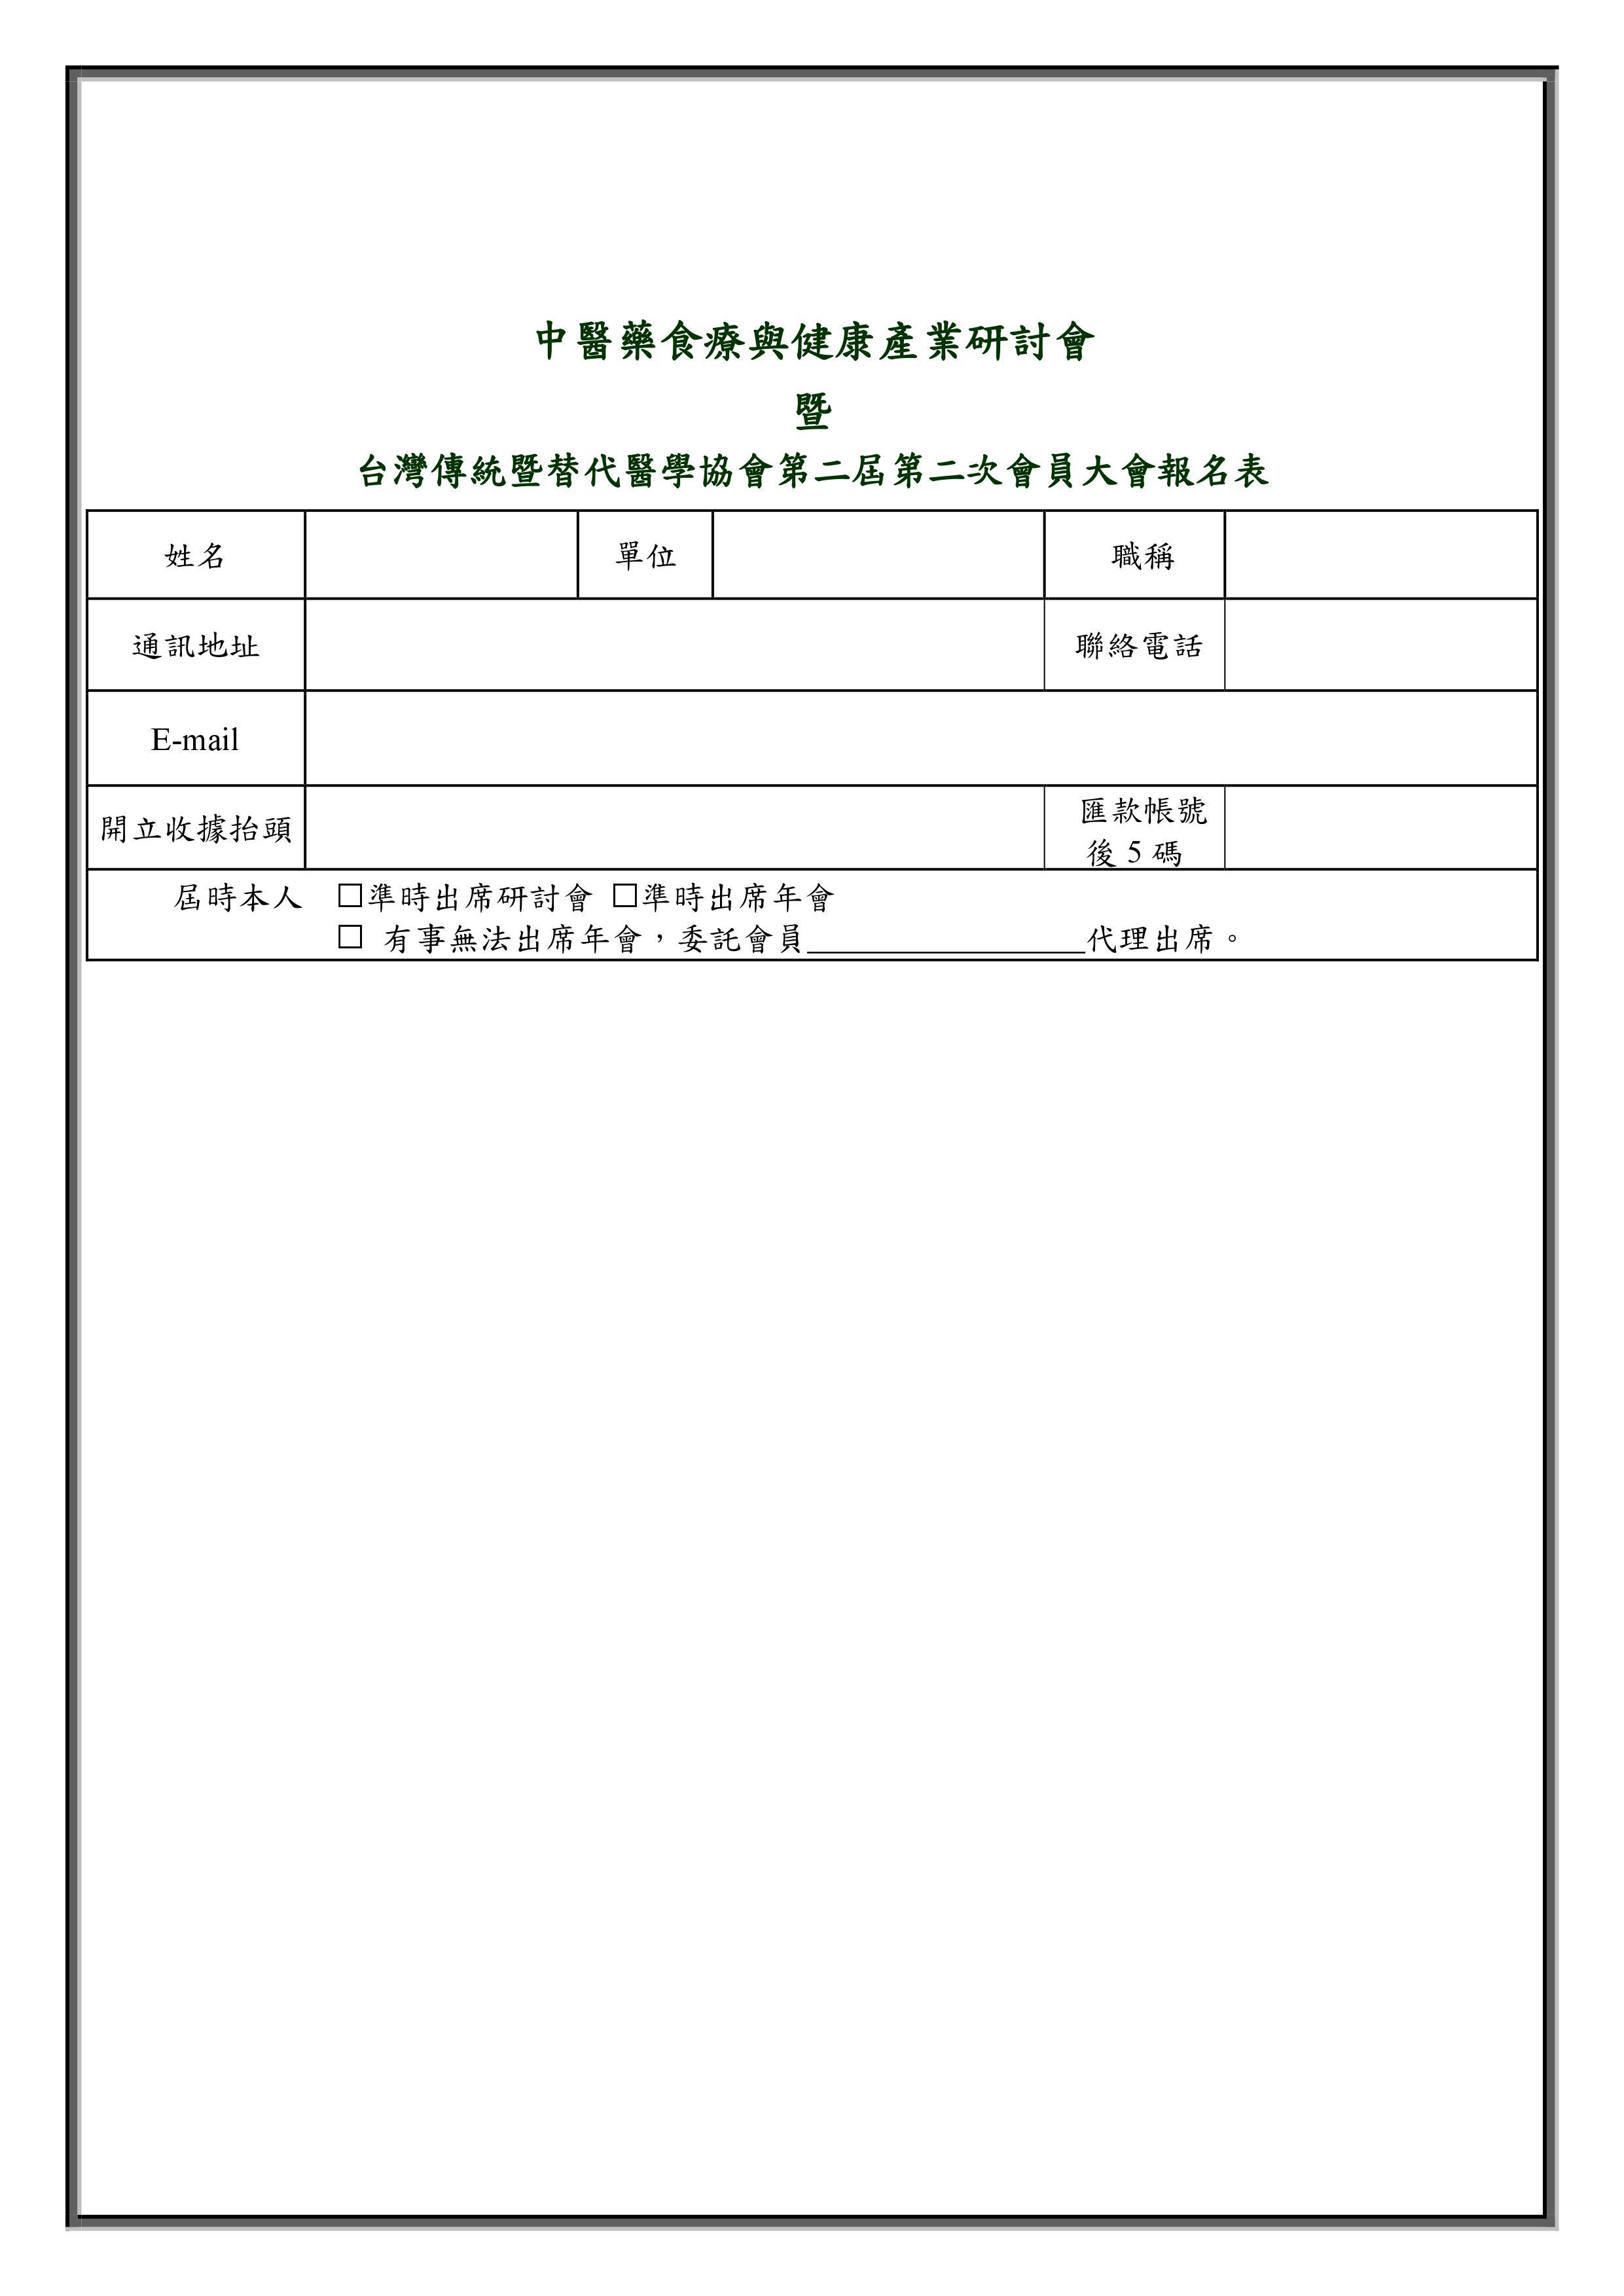 報名簡章0308-1